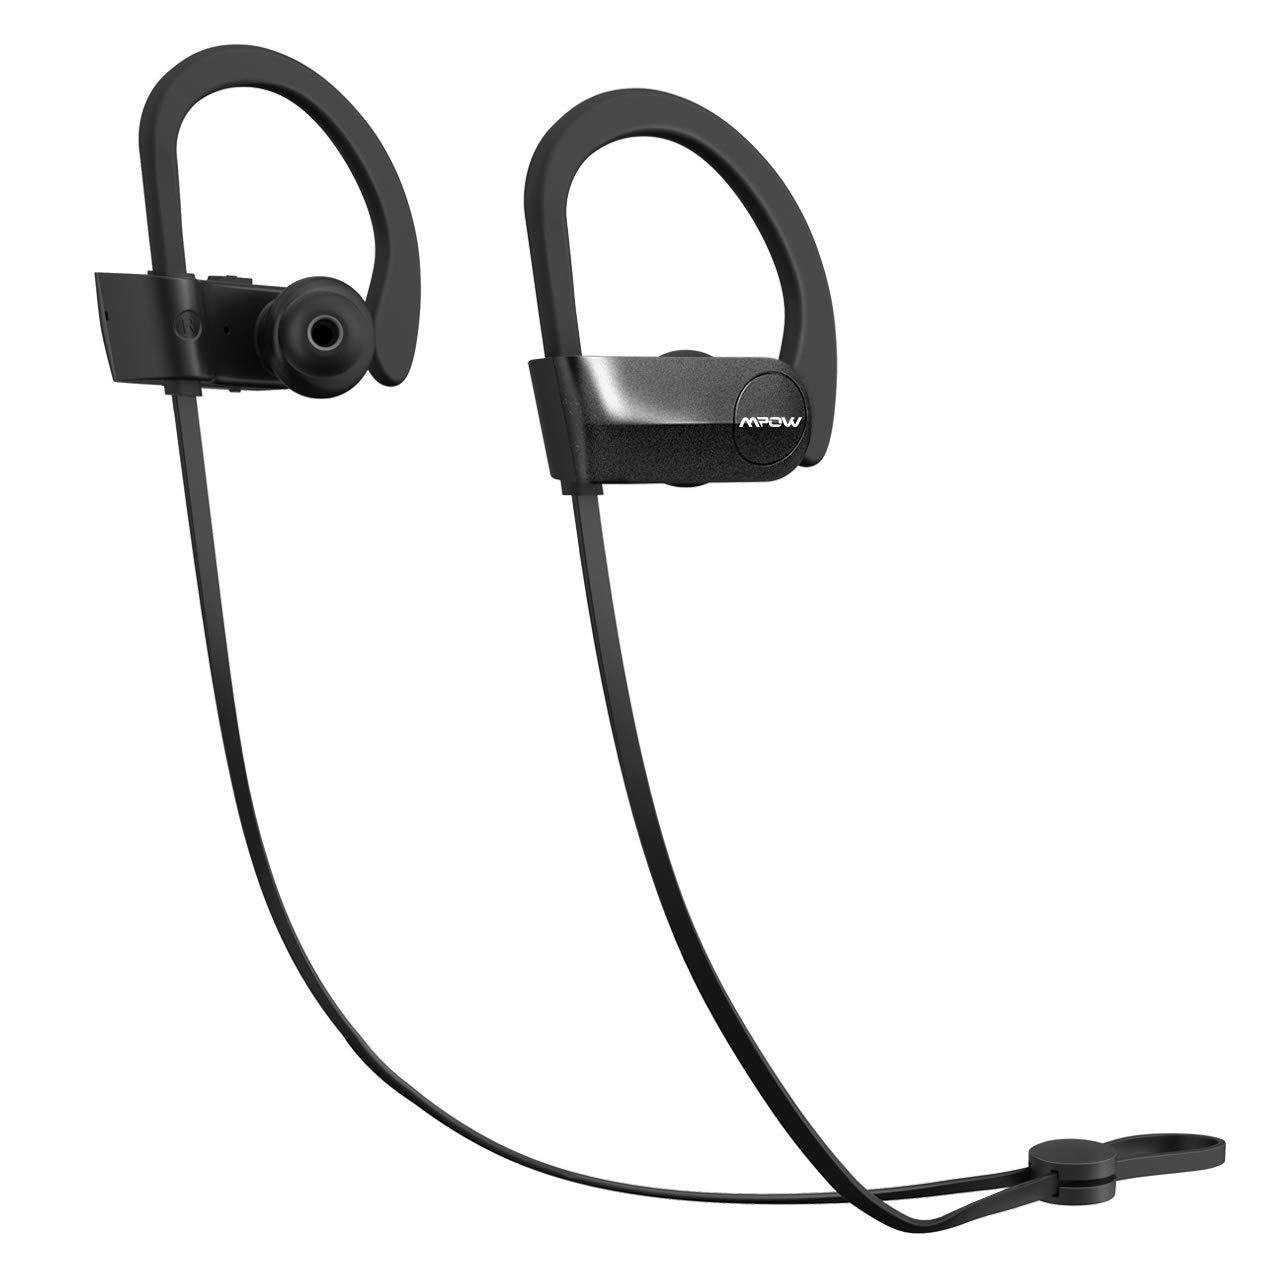 Auriculares Mpow D7 Bluetooth IPX7 A Prueba de Agua Richer Bass Stereo Inalambrico Sport Earphones 10-12H Bateria Cancel